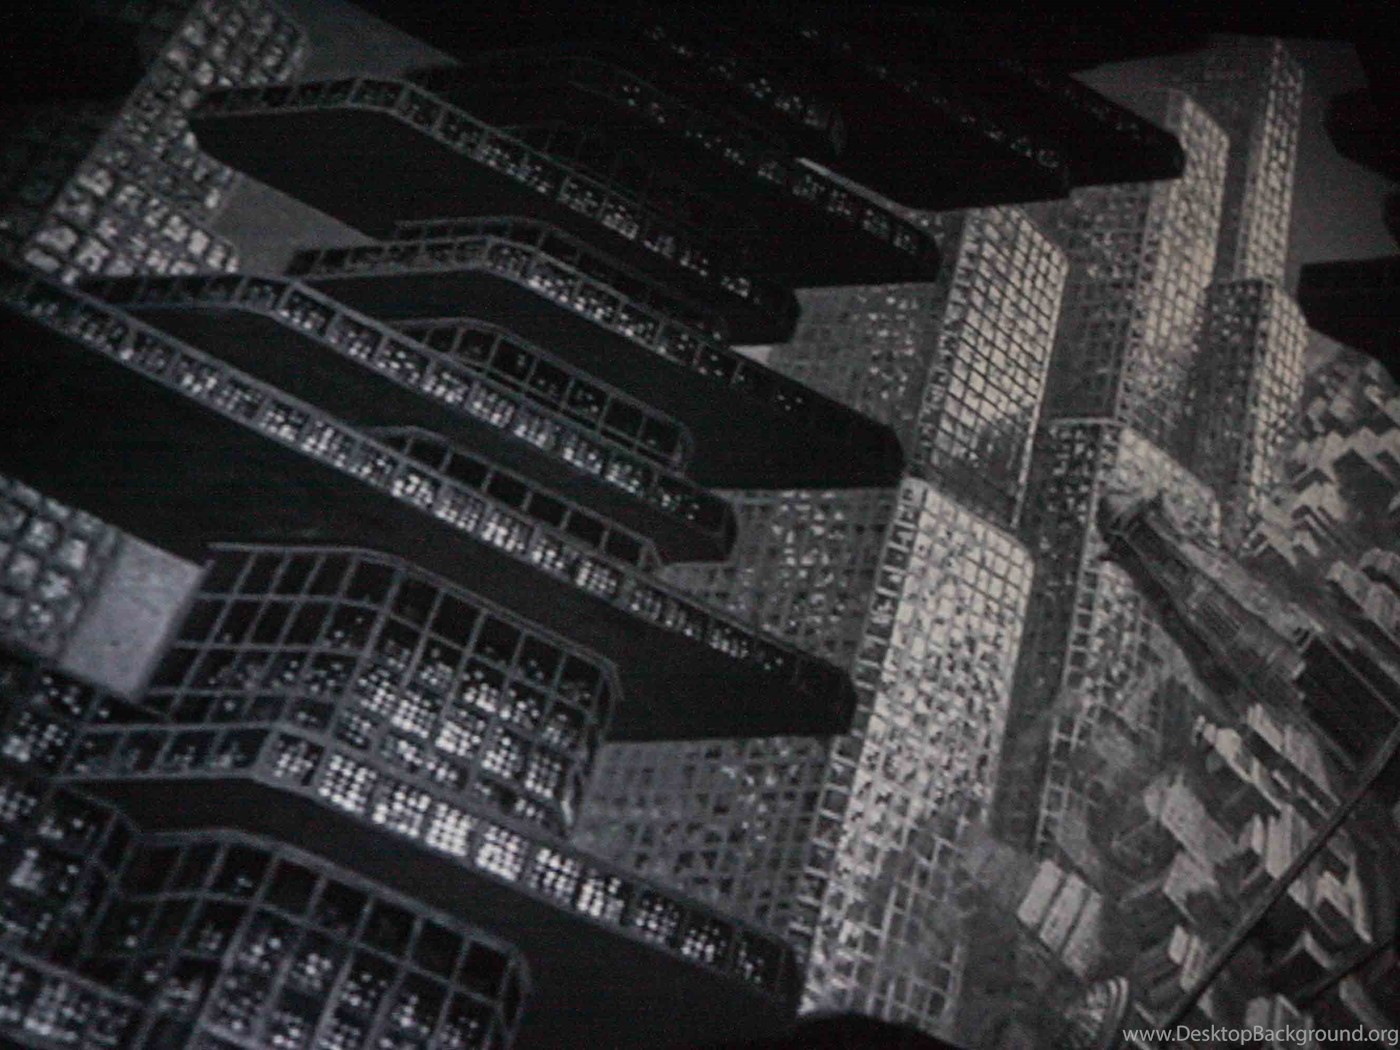 metropolis film analysis